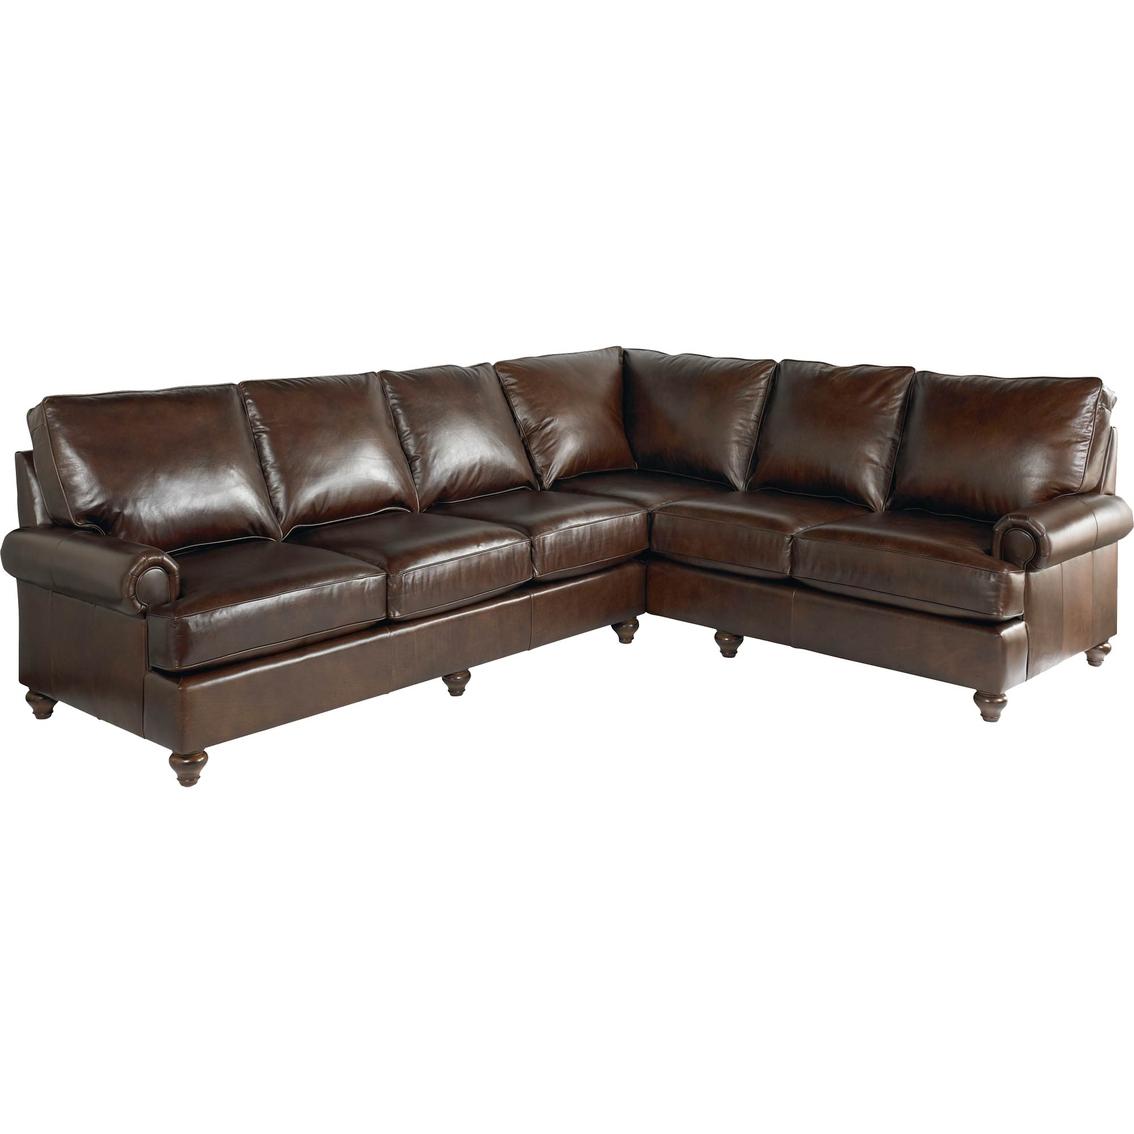 Bassett Montague Large Sectional Sofa